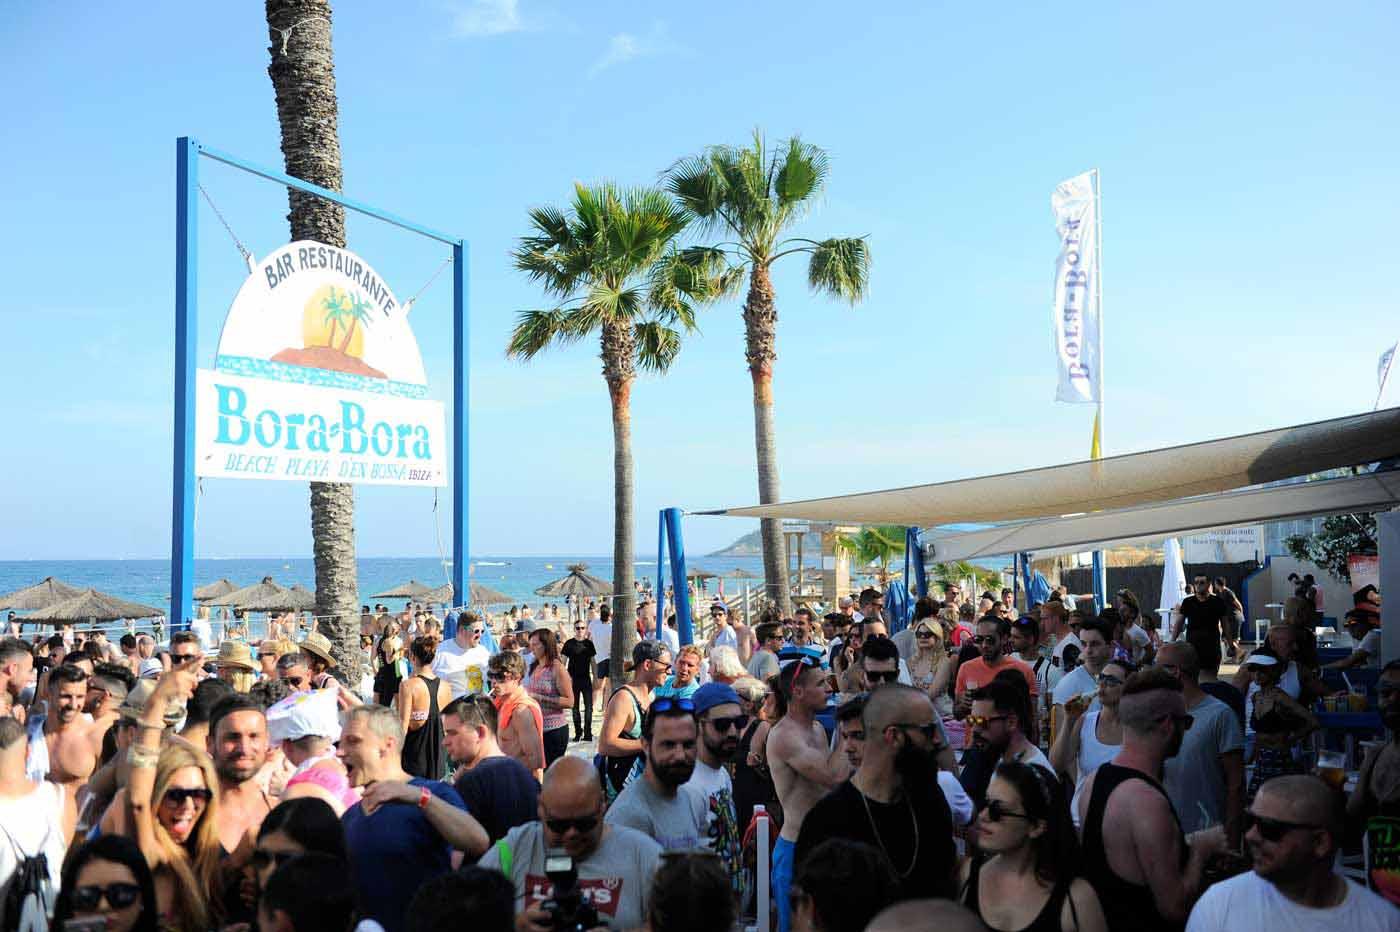 Dos días para celebrar la apertura de Bora Bora